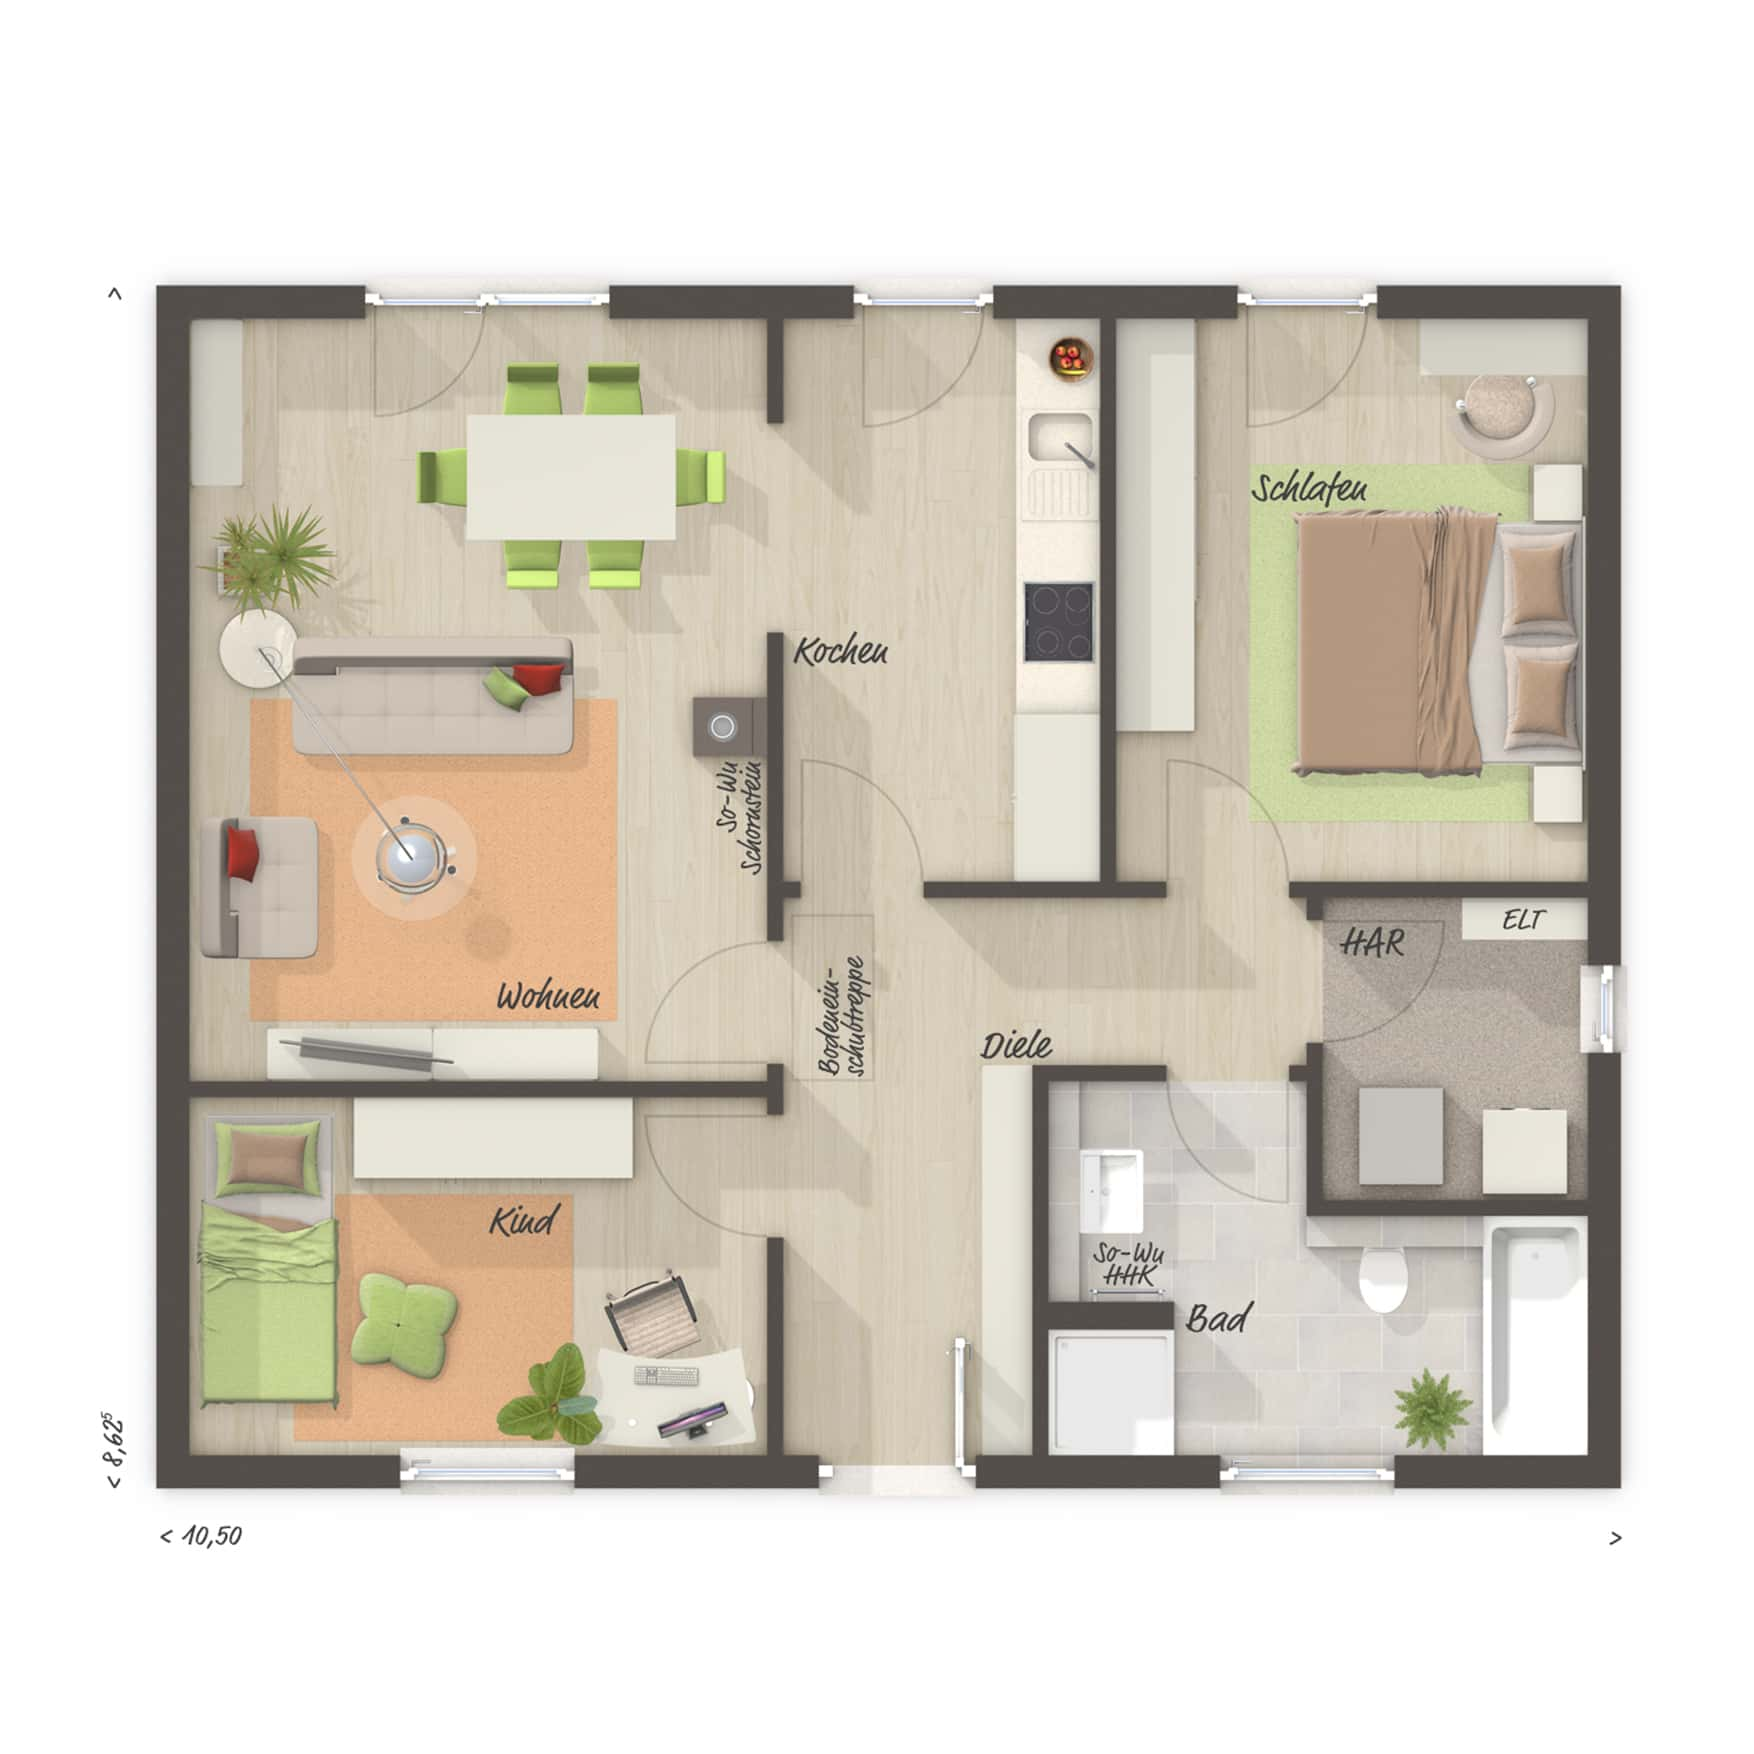 Grundriss Bungalow barrierefrei, 3 Zimmer, 77 qm - Massivhaus schlüsselfertig bauen Ideen Town Country Haus BUNGALOW 78 trend - HausbauDirekt.de